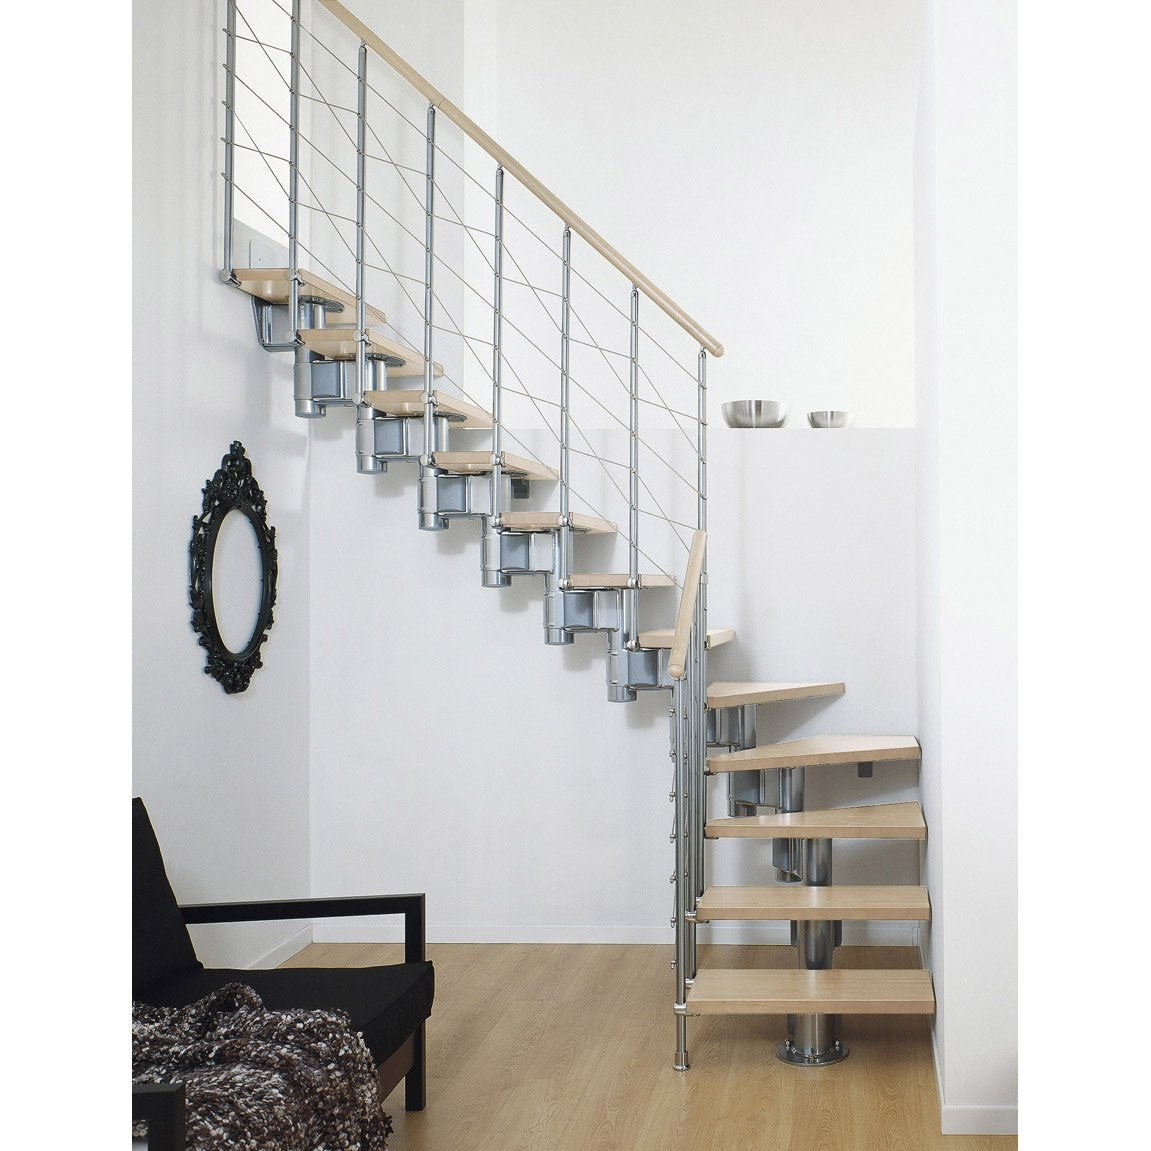 Escalier modulaire long structure m tal marche bois leroy merlin - Escalier leroy merlin ...